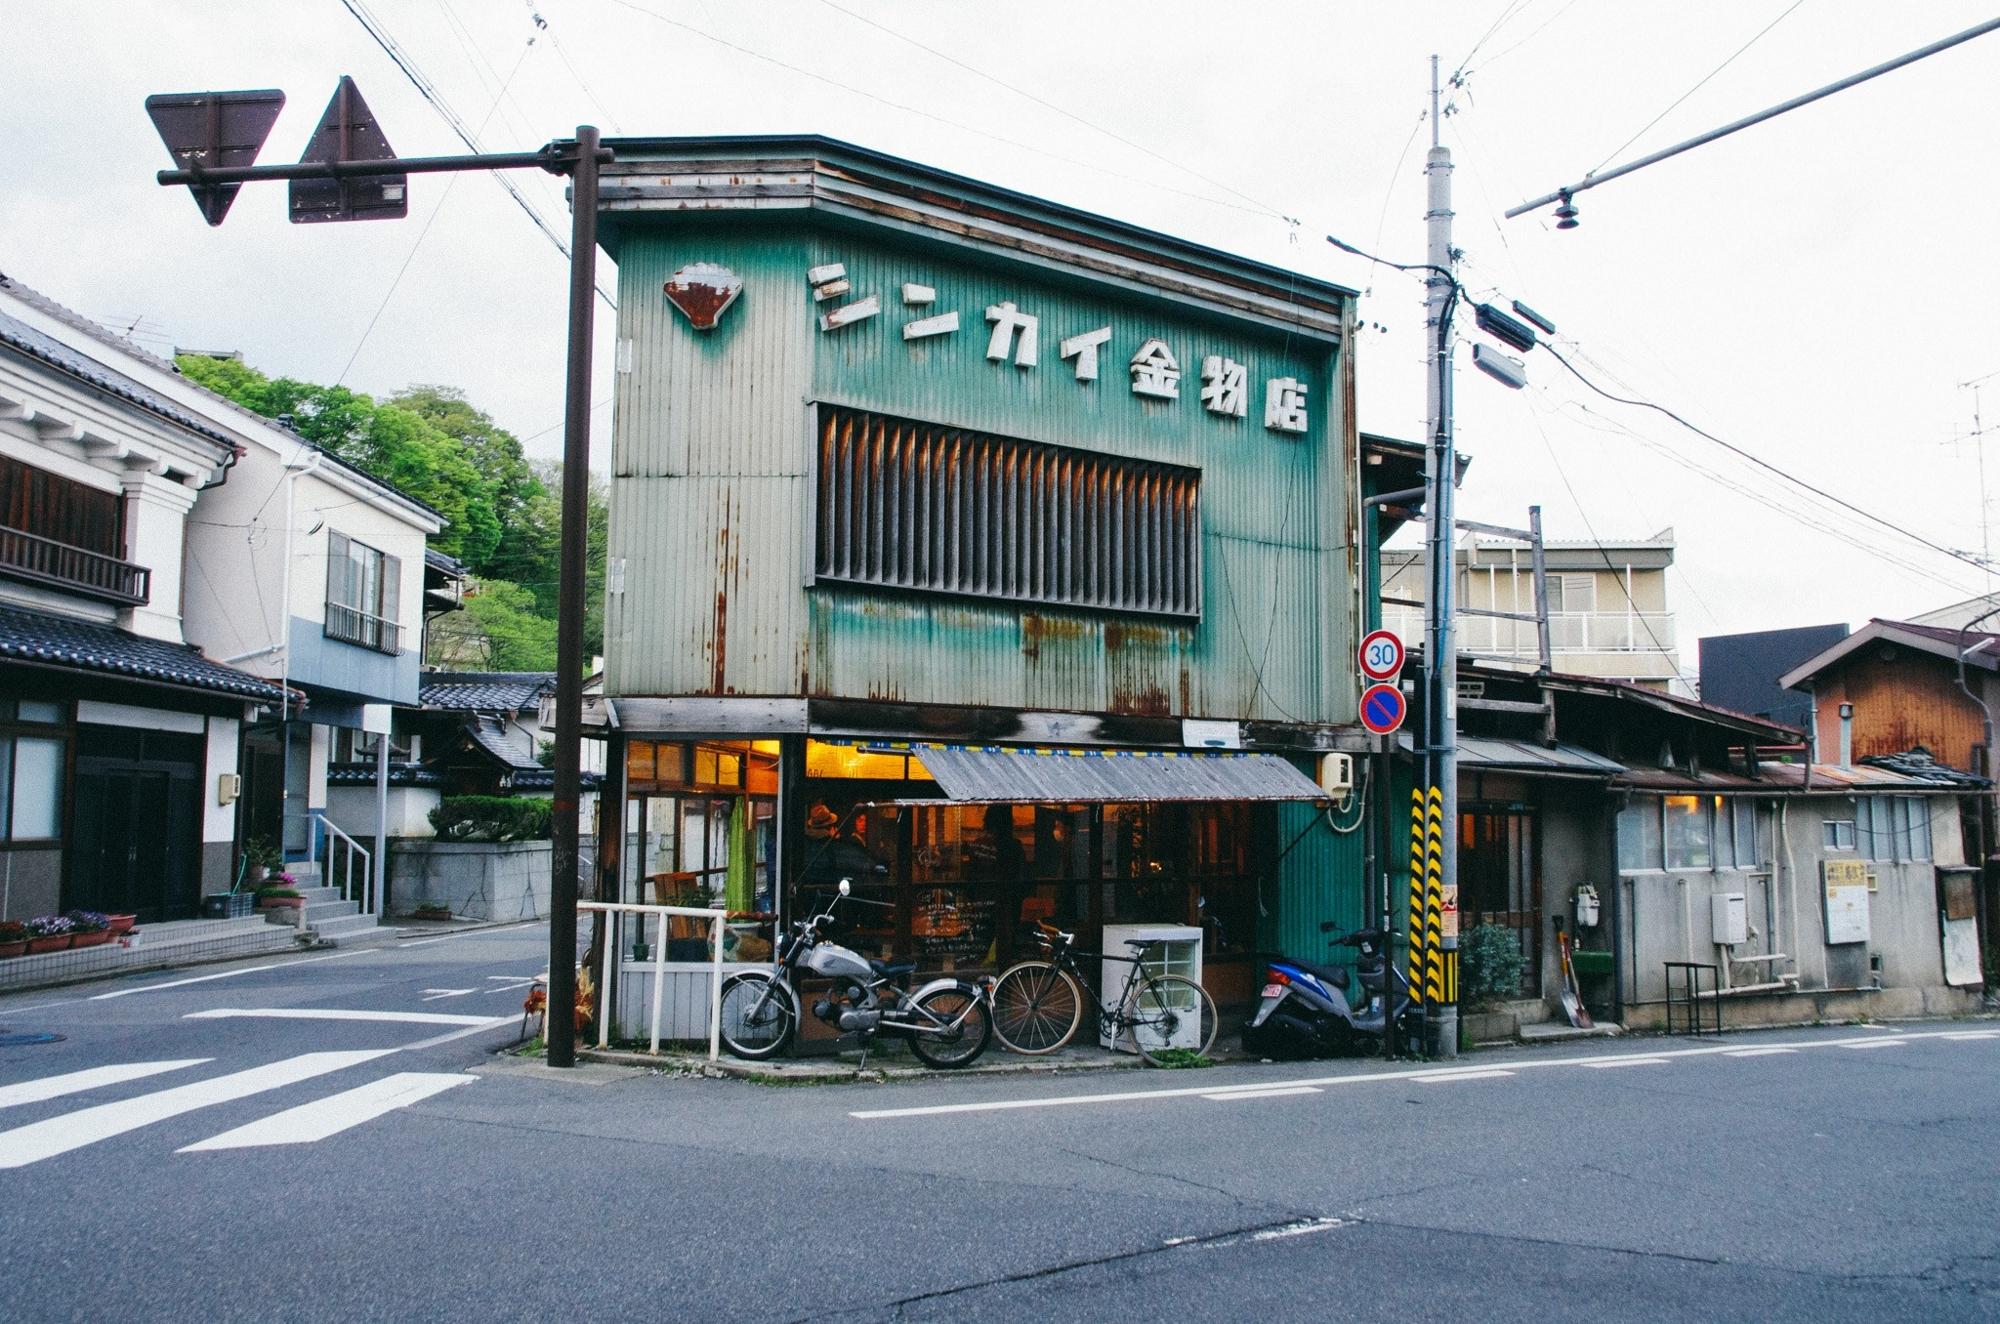 http://cdn-ak.f.st-hatena.com/images/fotolife/k/kakijiro/20160504/20160504000453.jpg